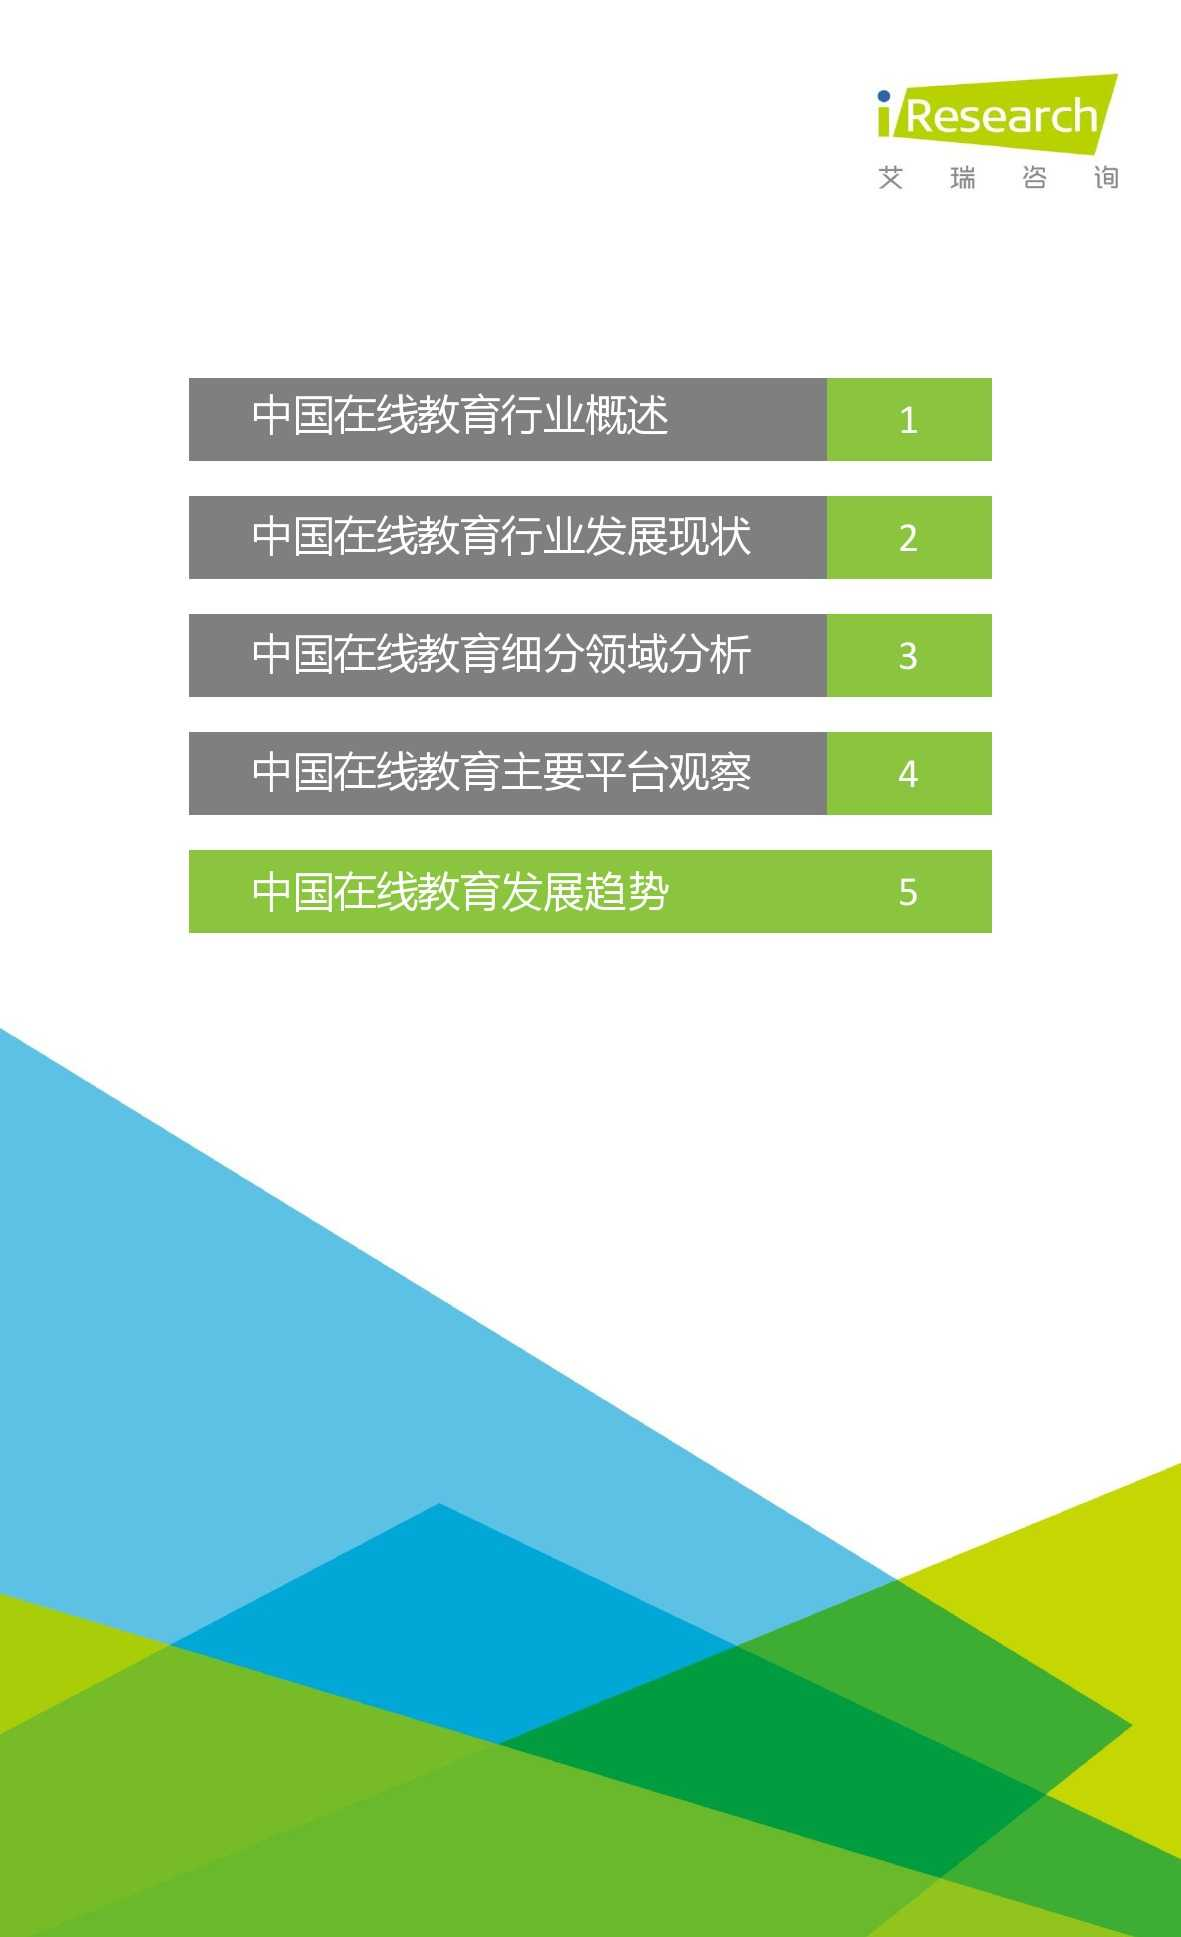 iResearch-2015年中国在线教育平台研究报告_000048